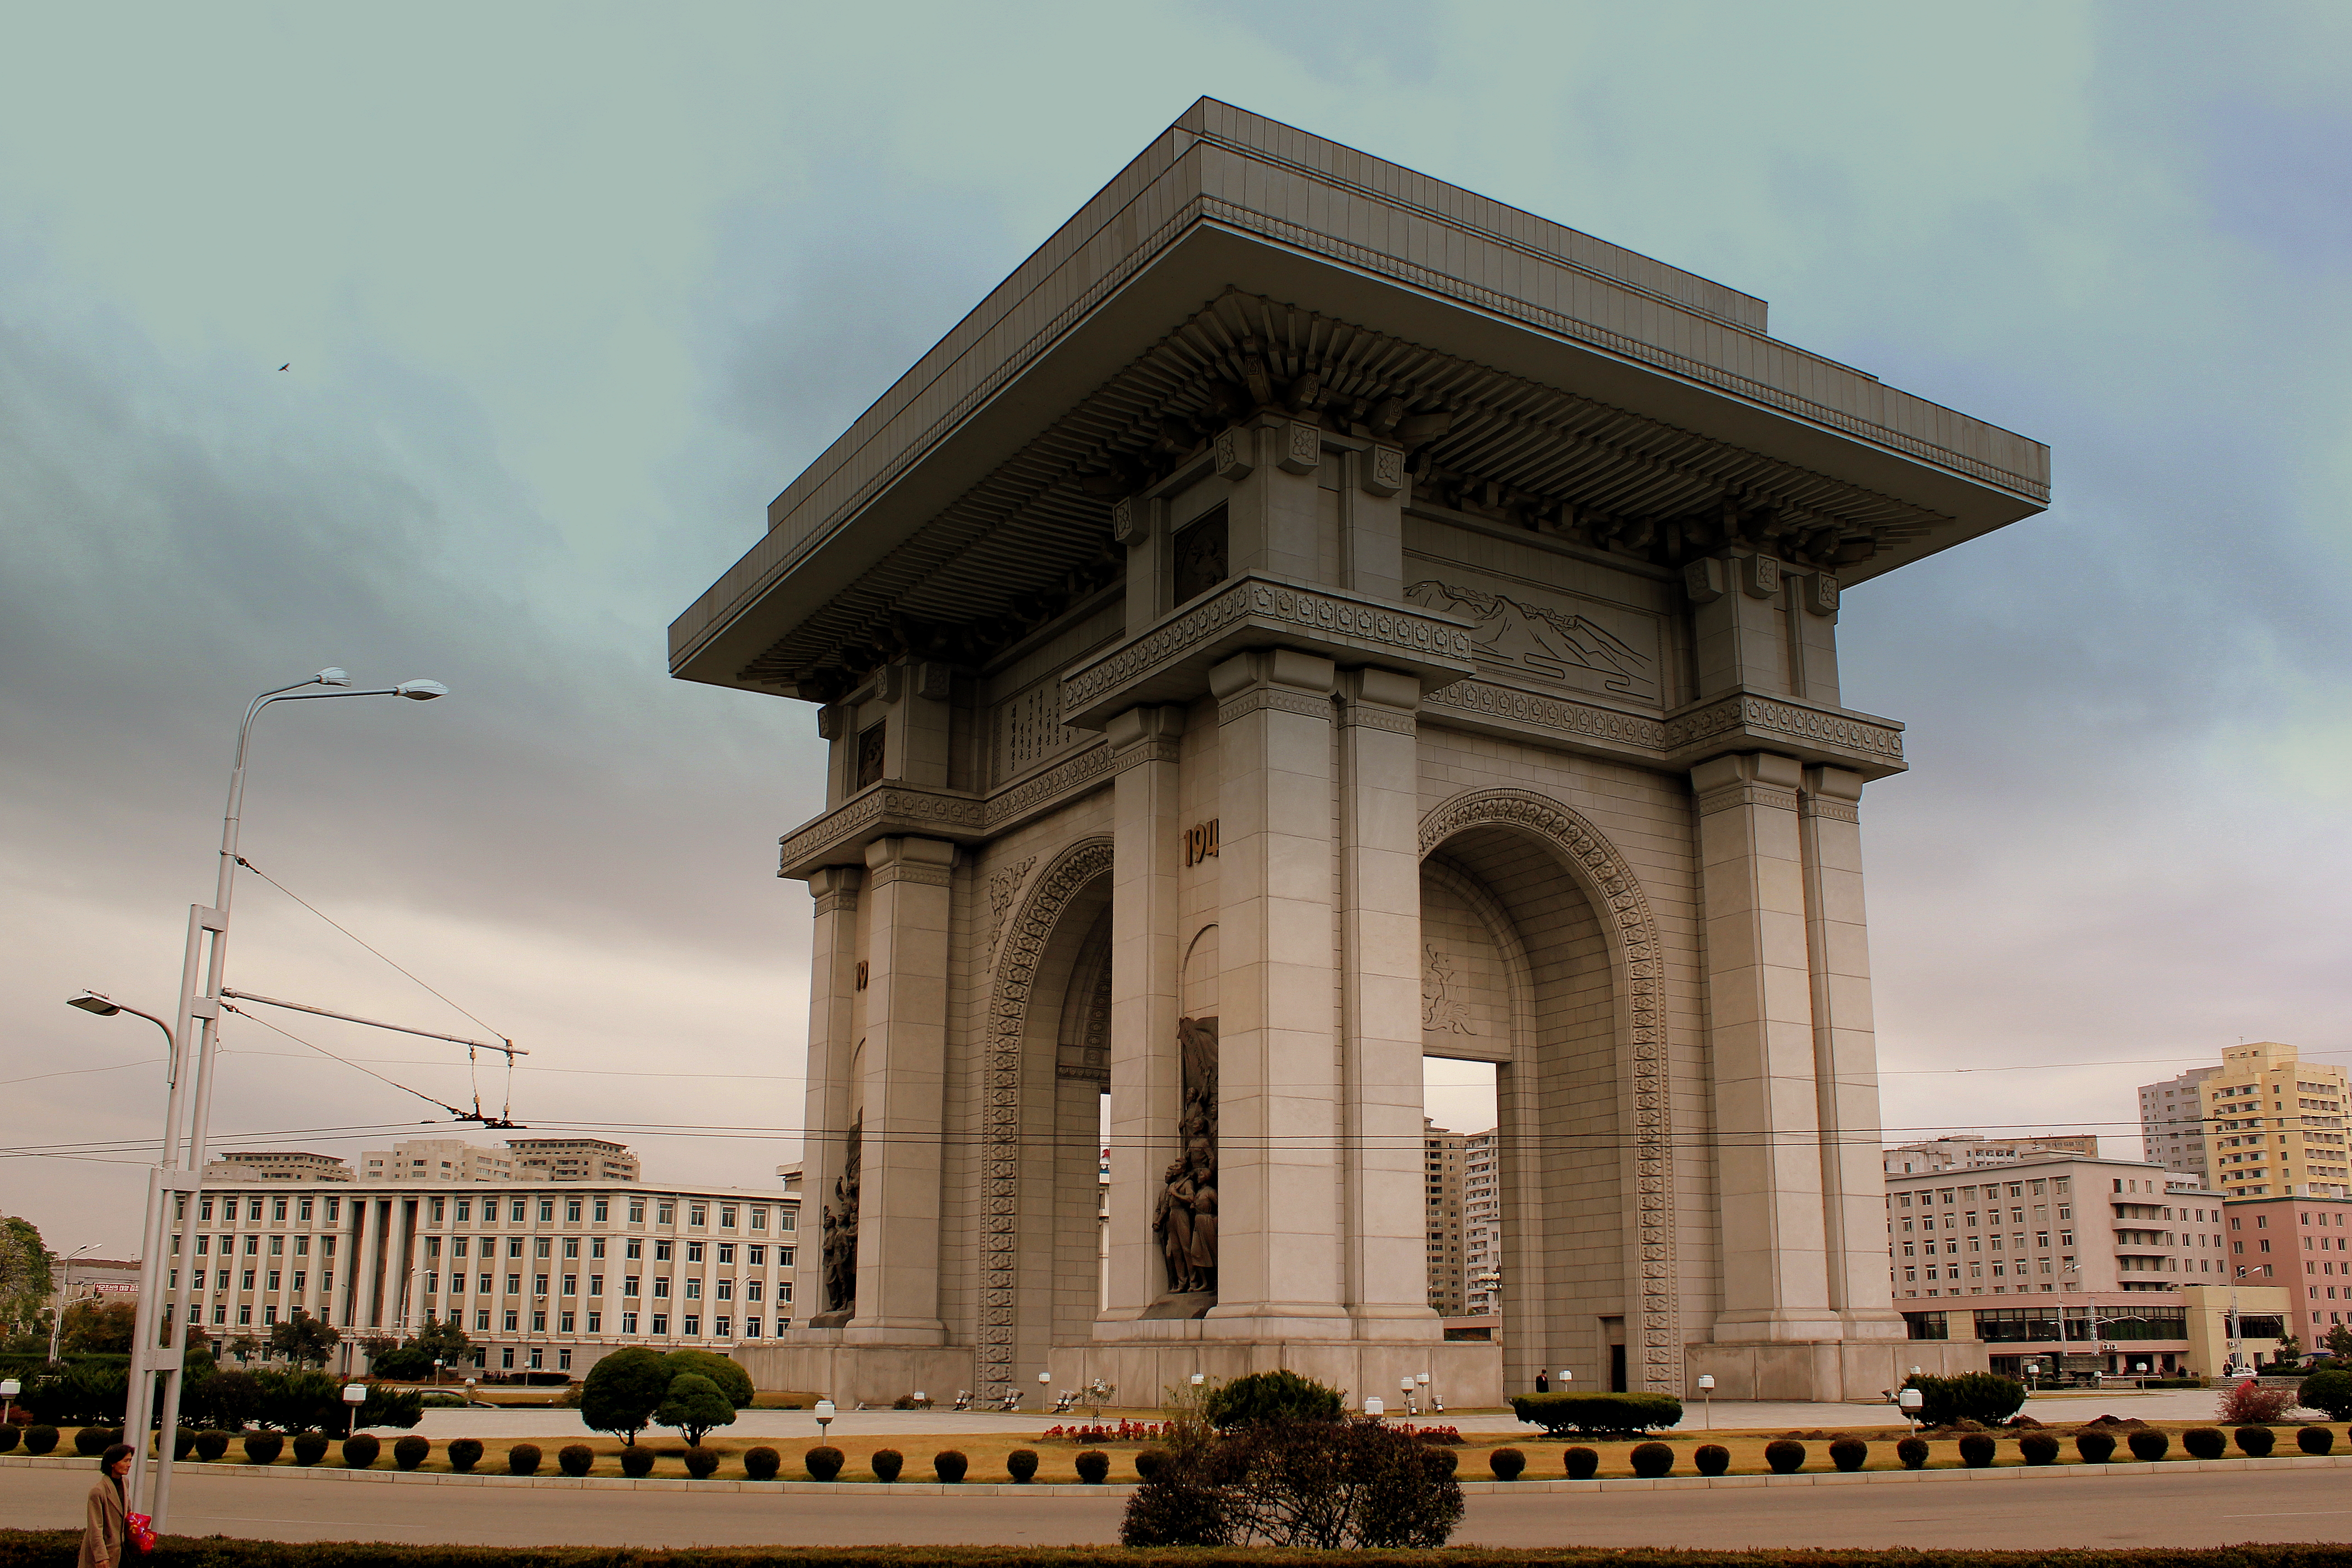 file:arch of triumph pyongyang city dprk north korea oct 2012